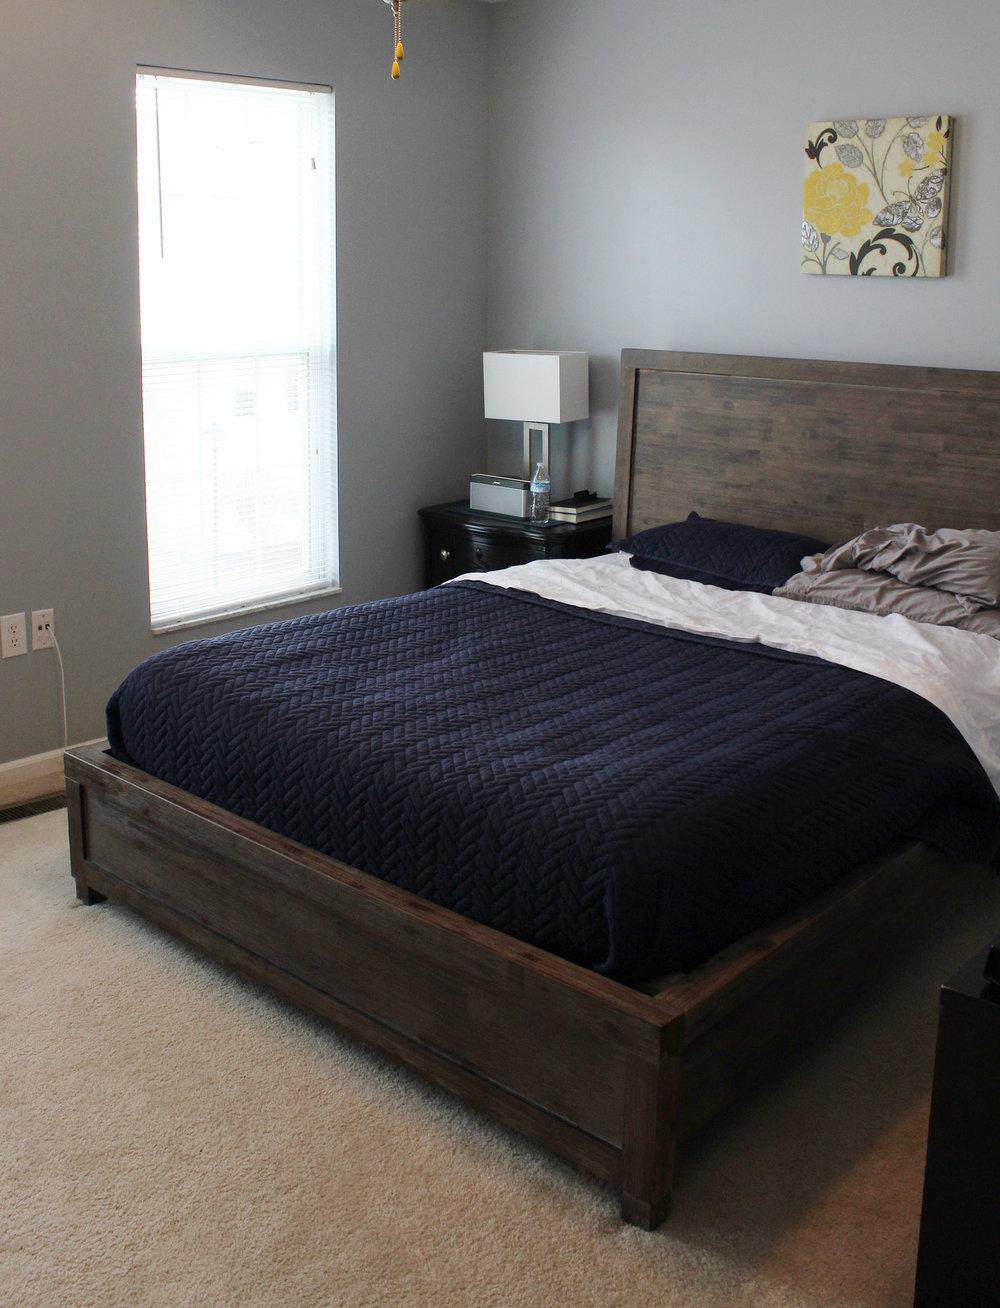 b-bed2 (1).jpg